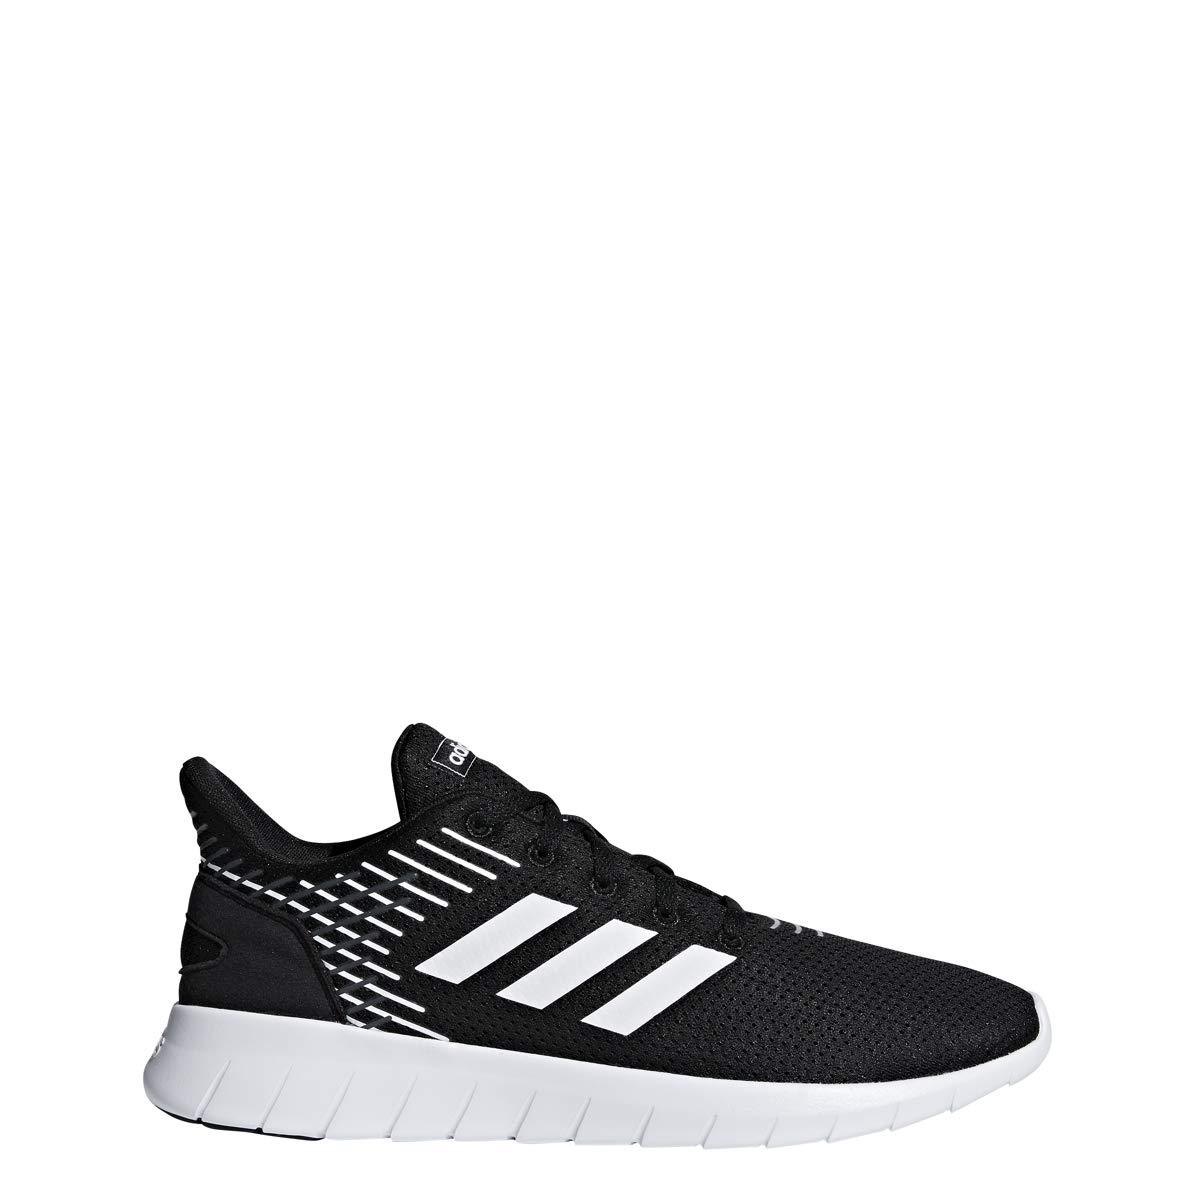 Amazon.com | adidas Asweerun Shoe - Men